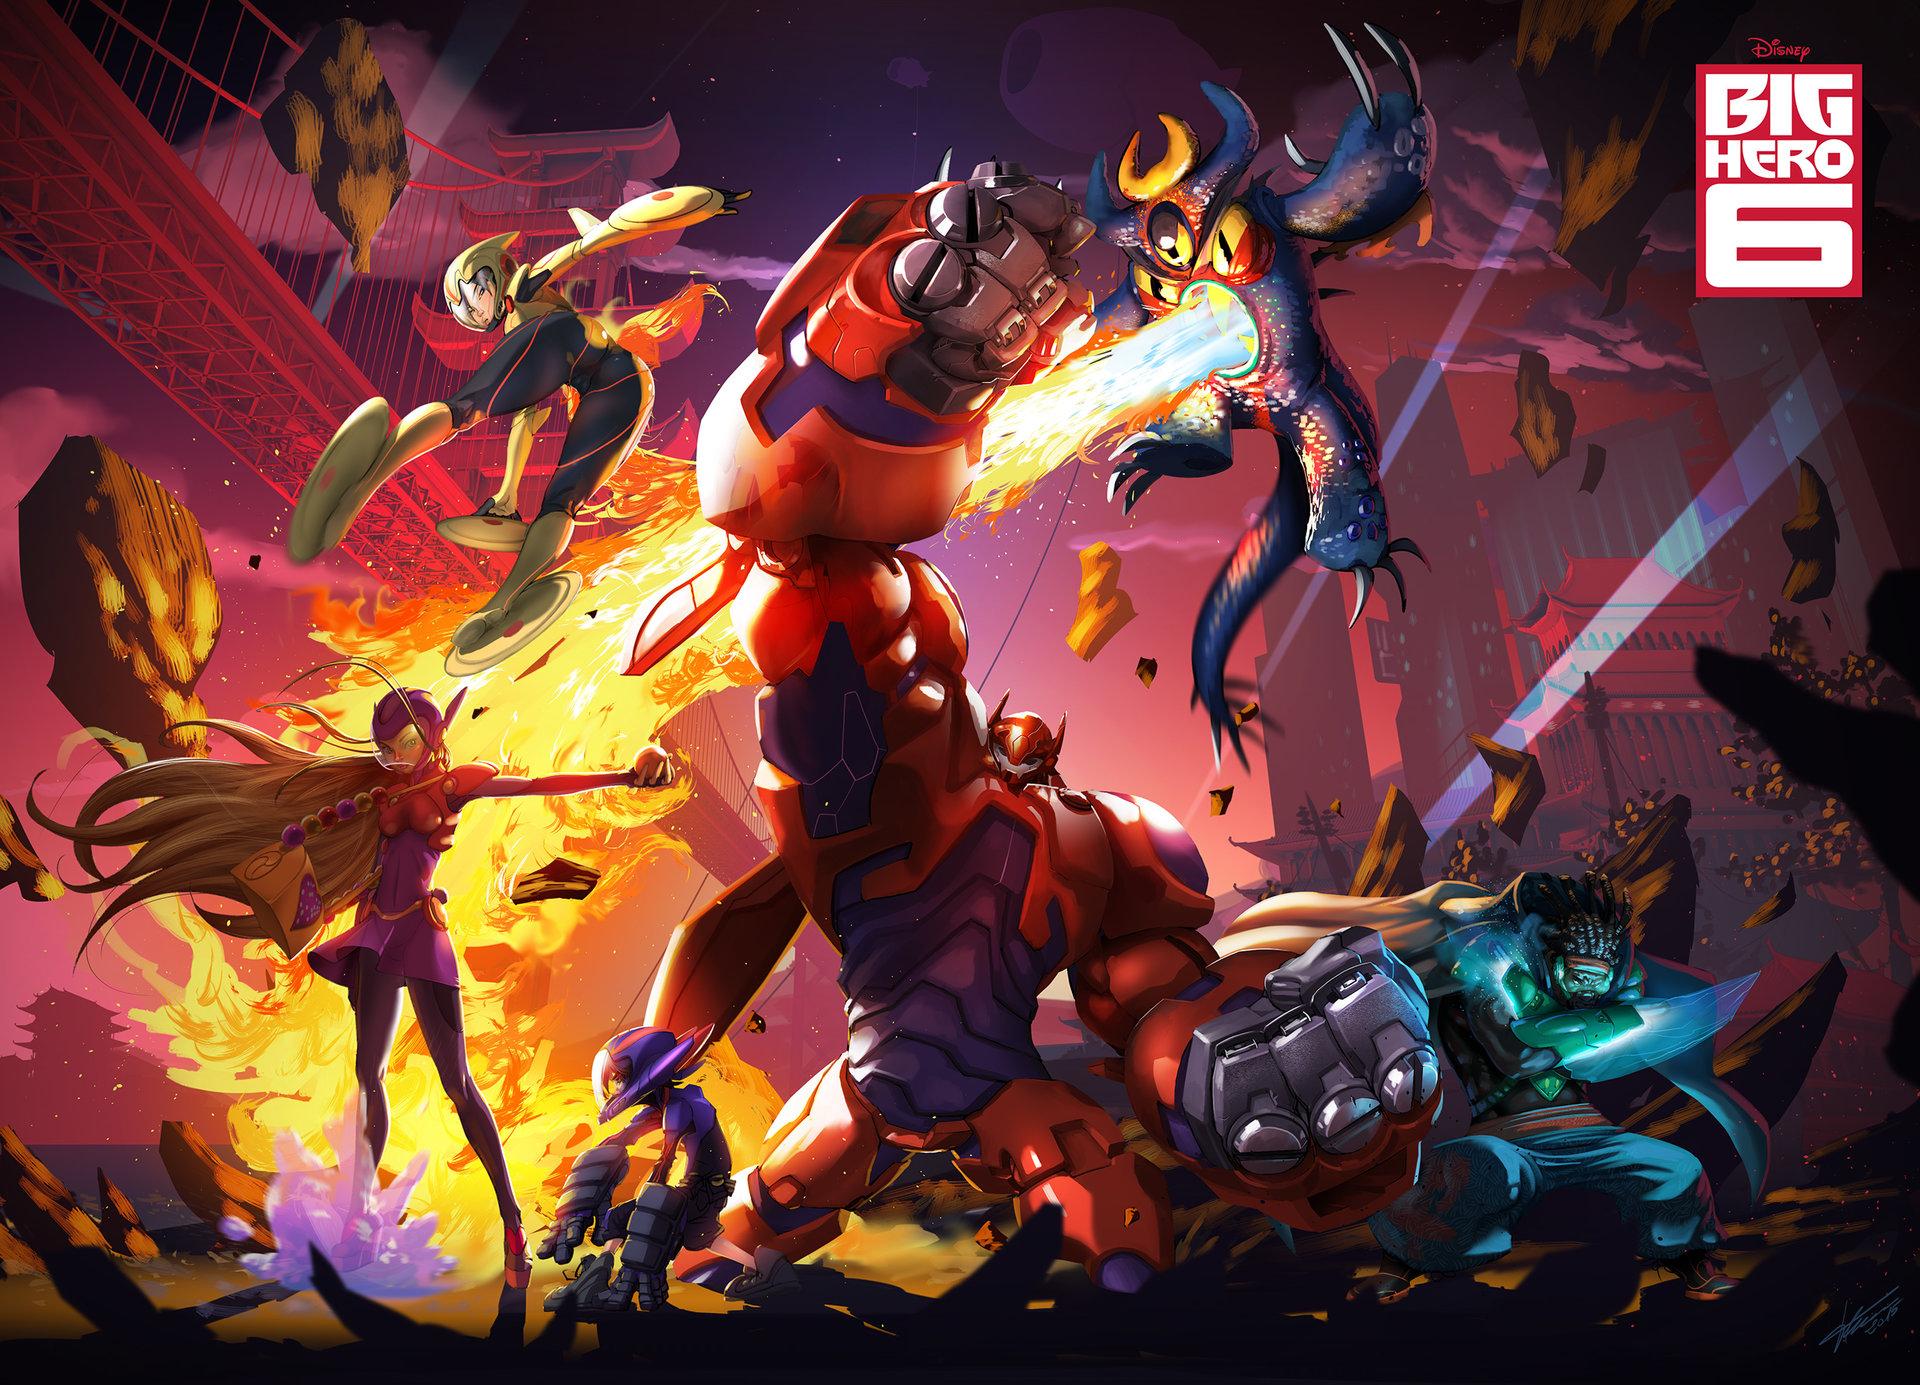 Big Hero 6 HD Wallpaper | Background Image | 1920x1385 ...